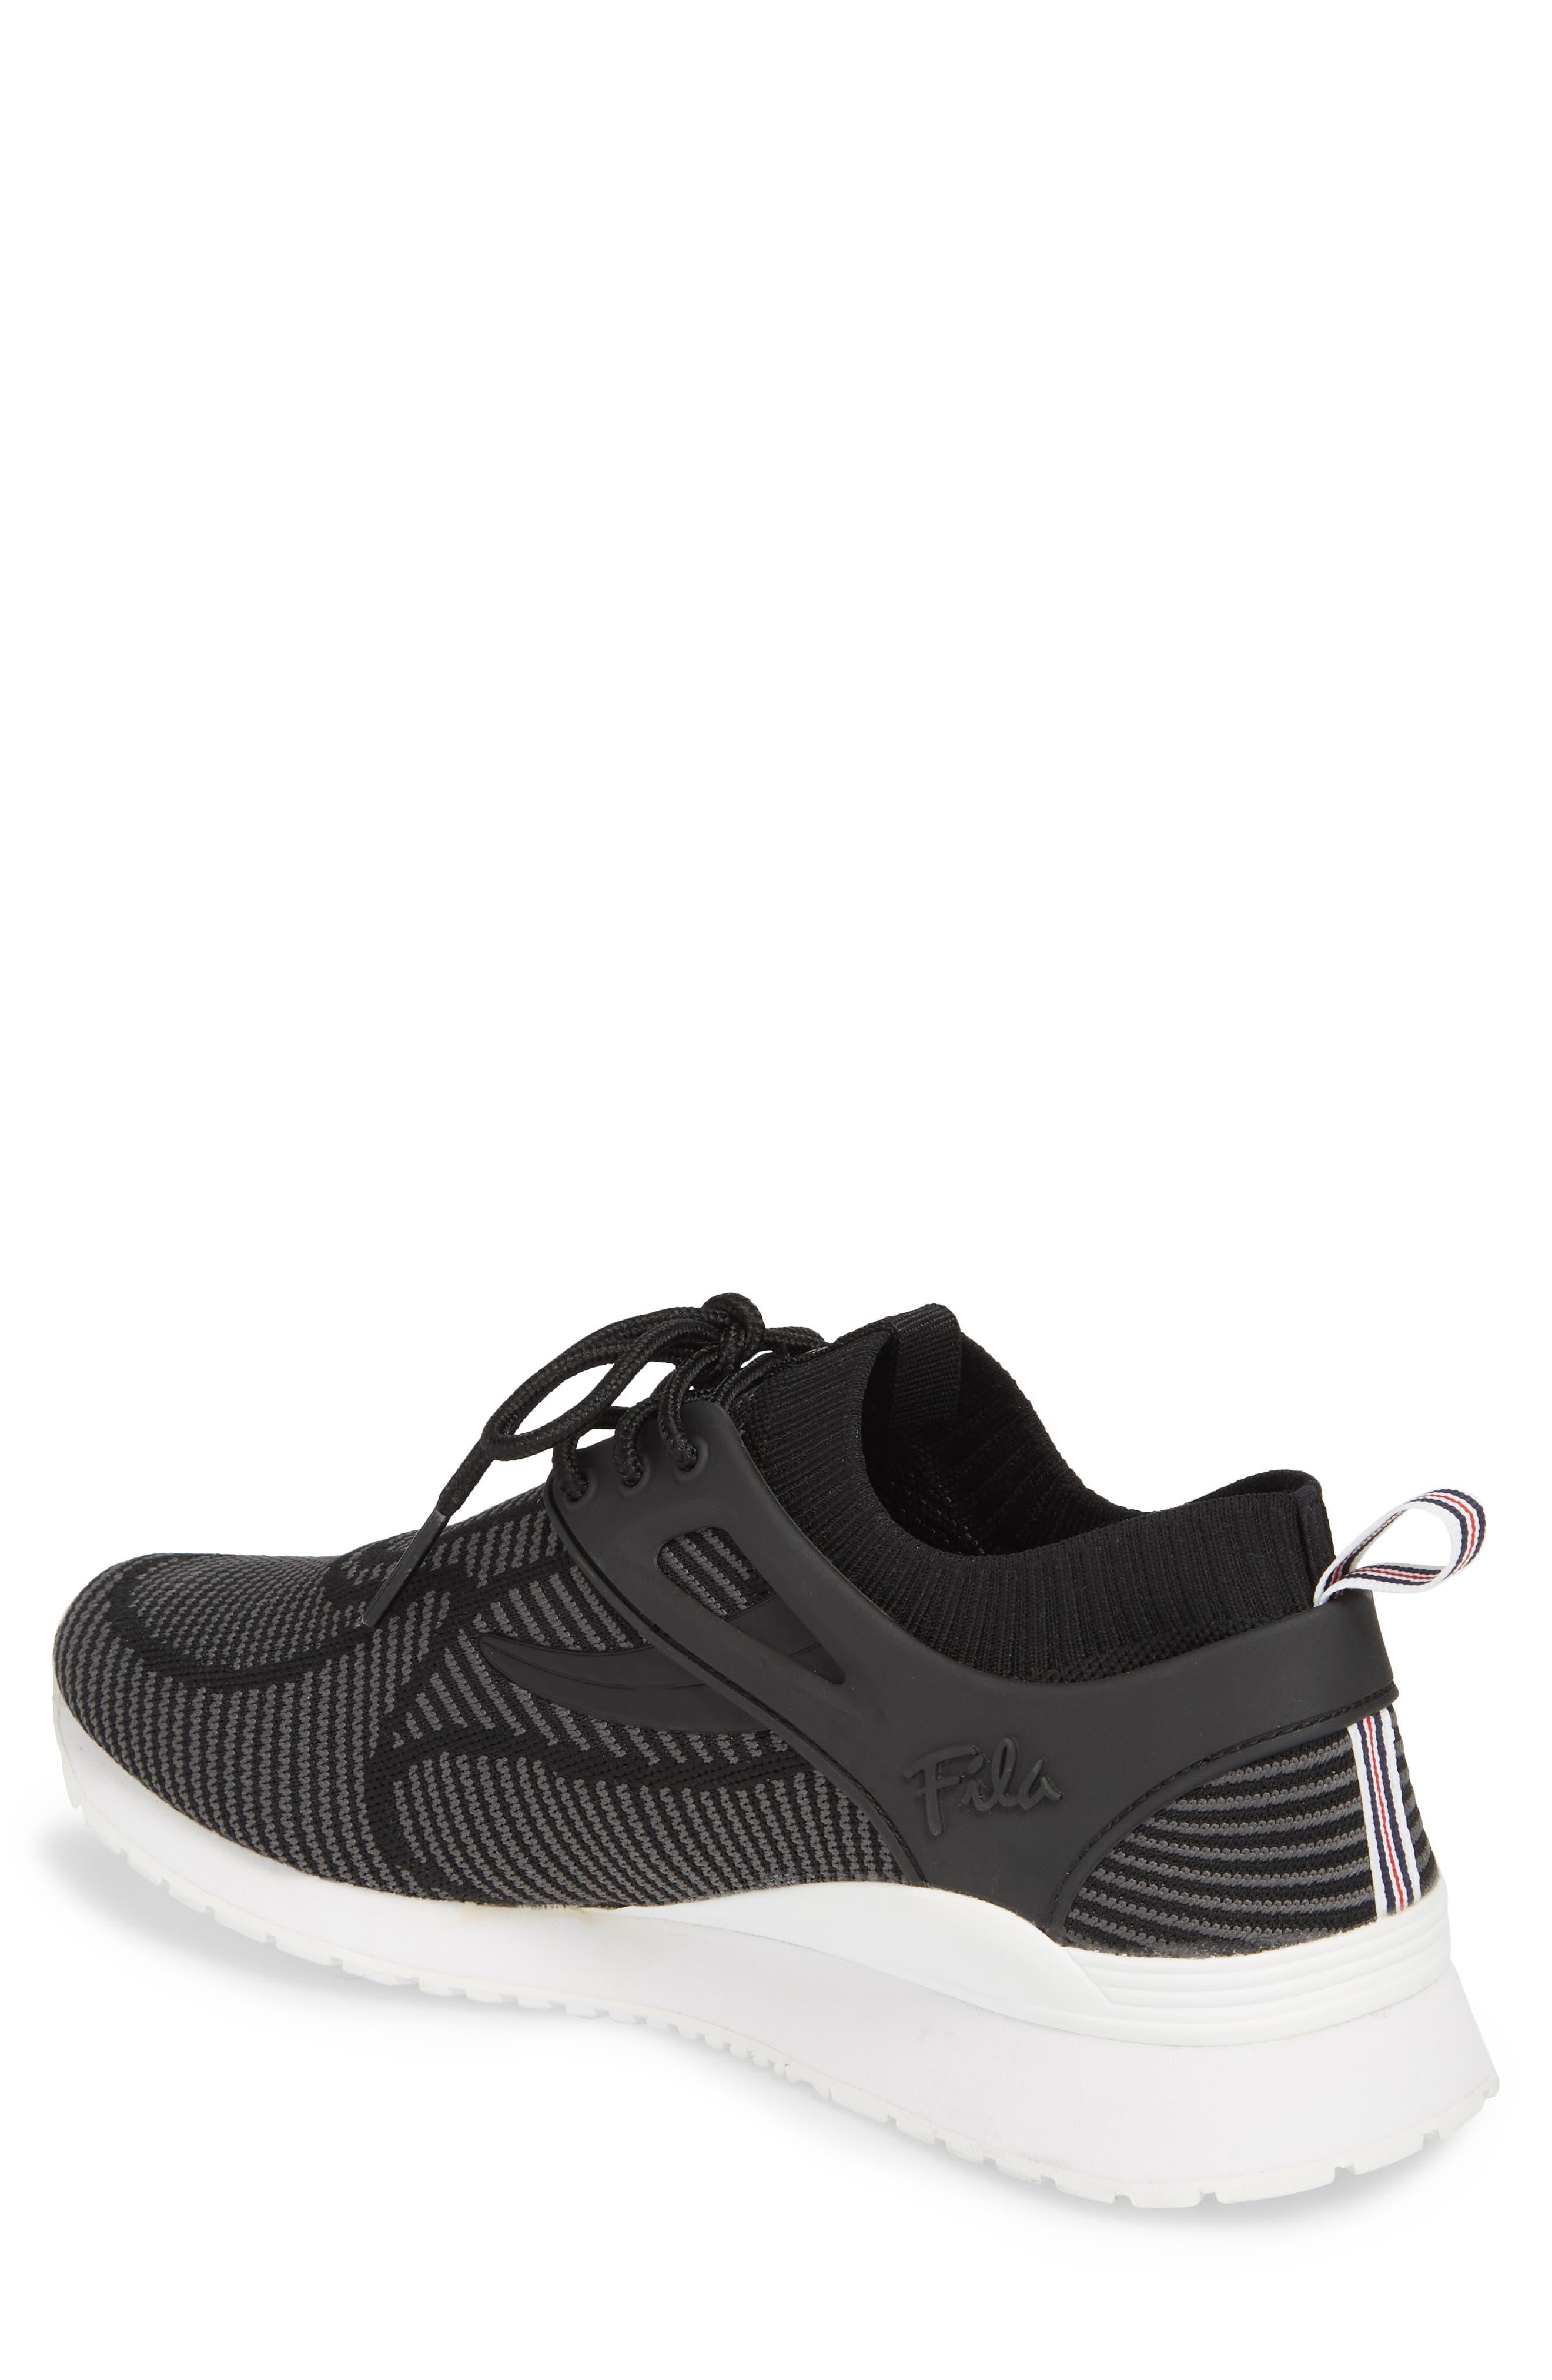 Overpass 2.0 Knit Sneaker,                             Alternate thumbnail 2, color,                             003